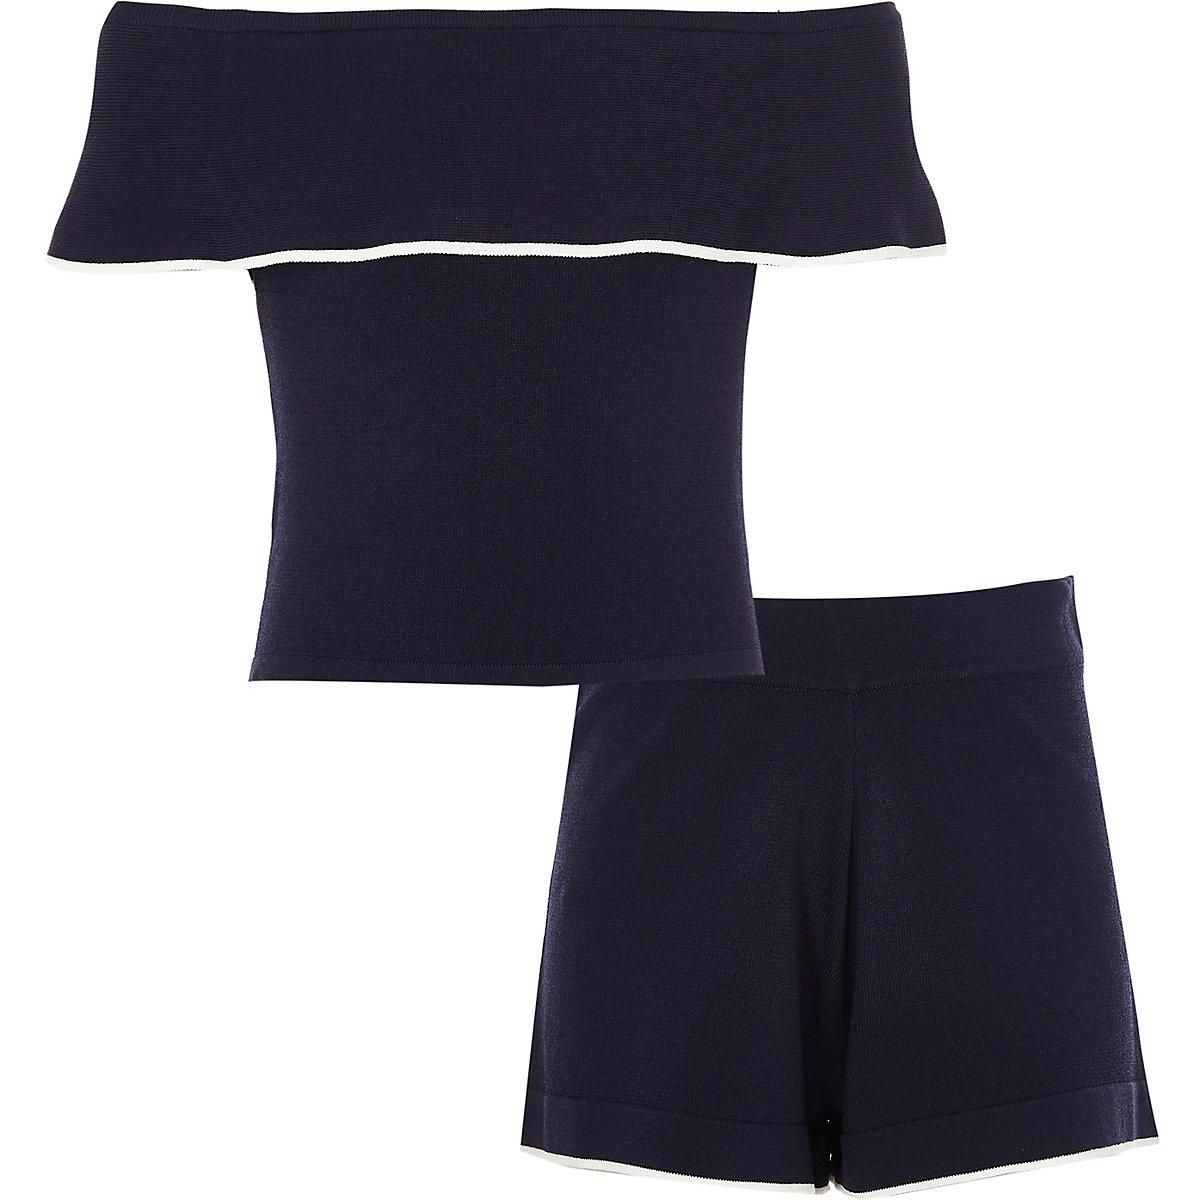 Girls navy bardot top and shorts outfit